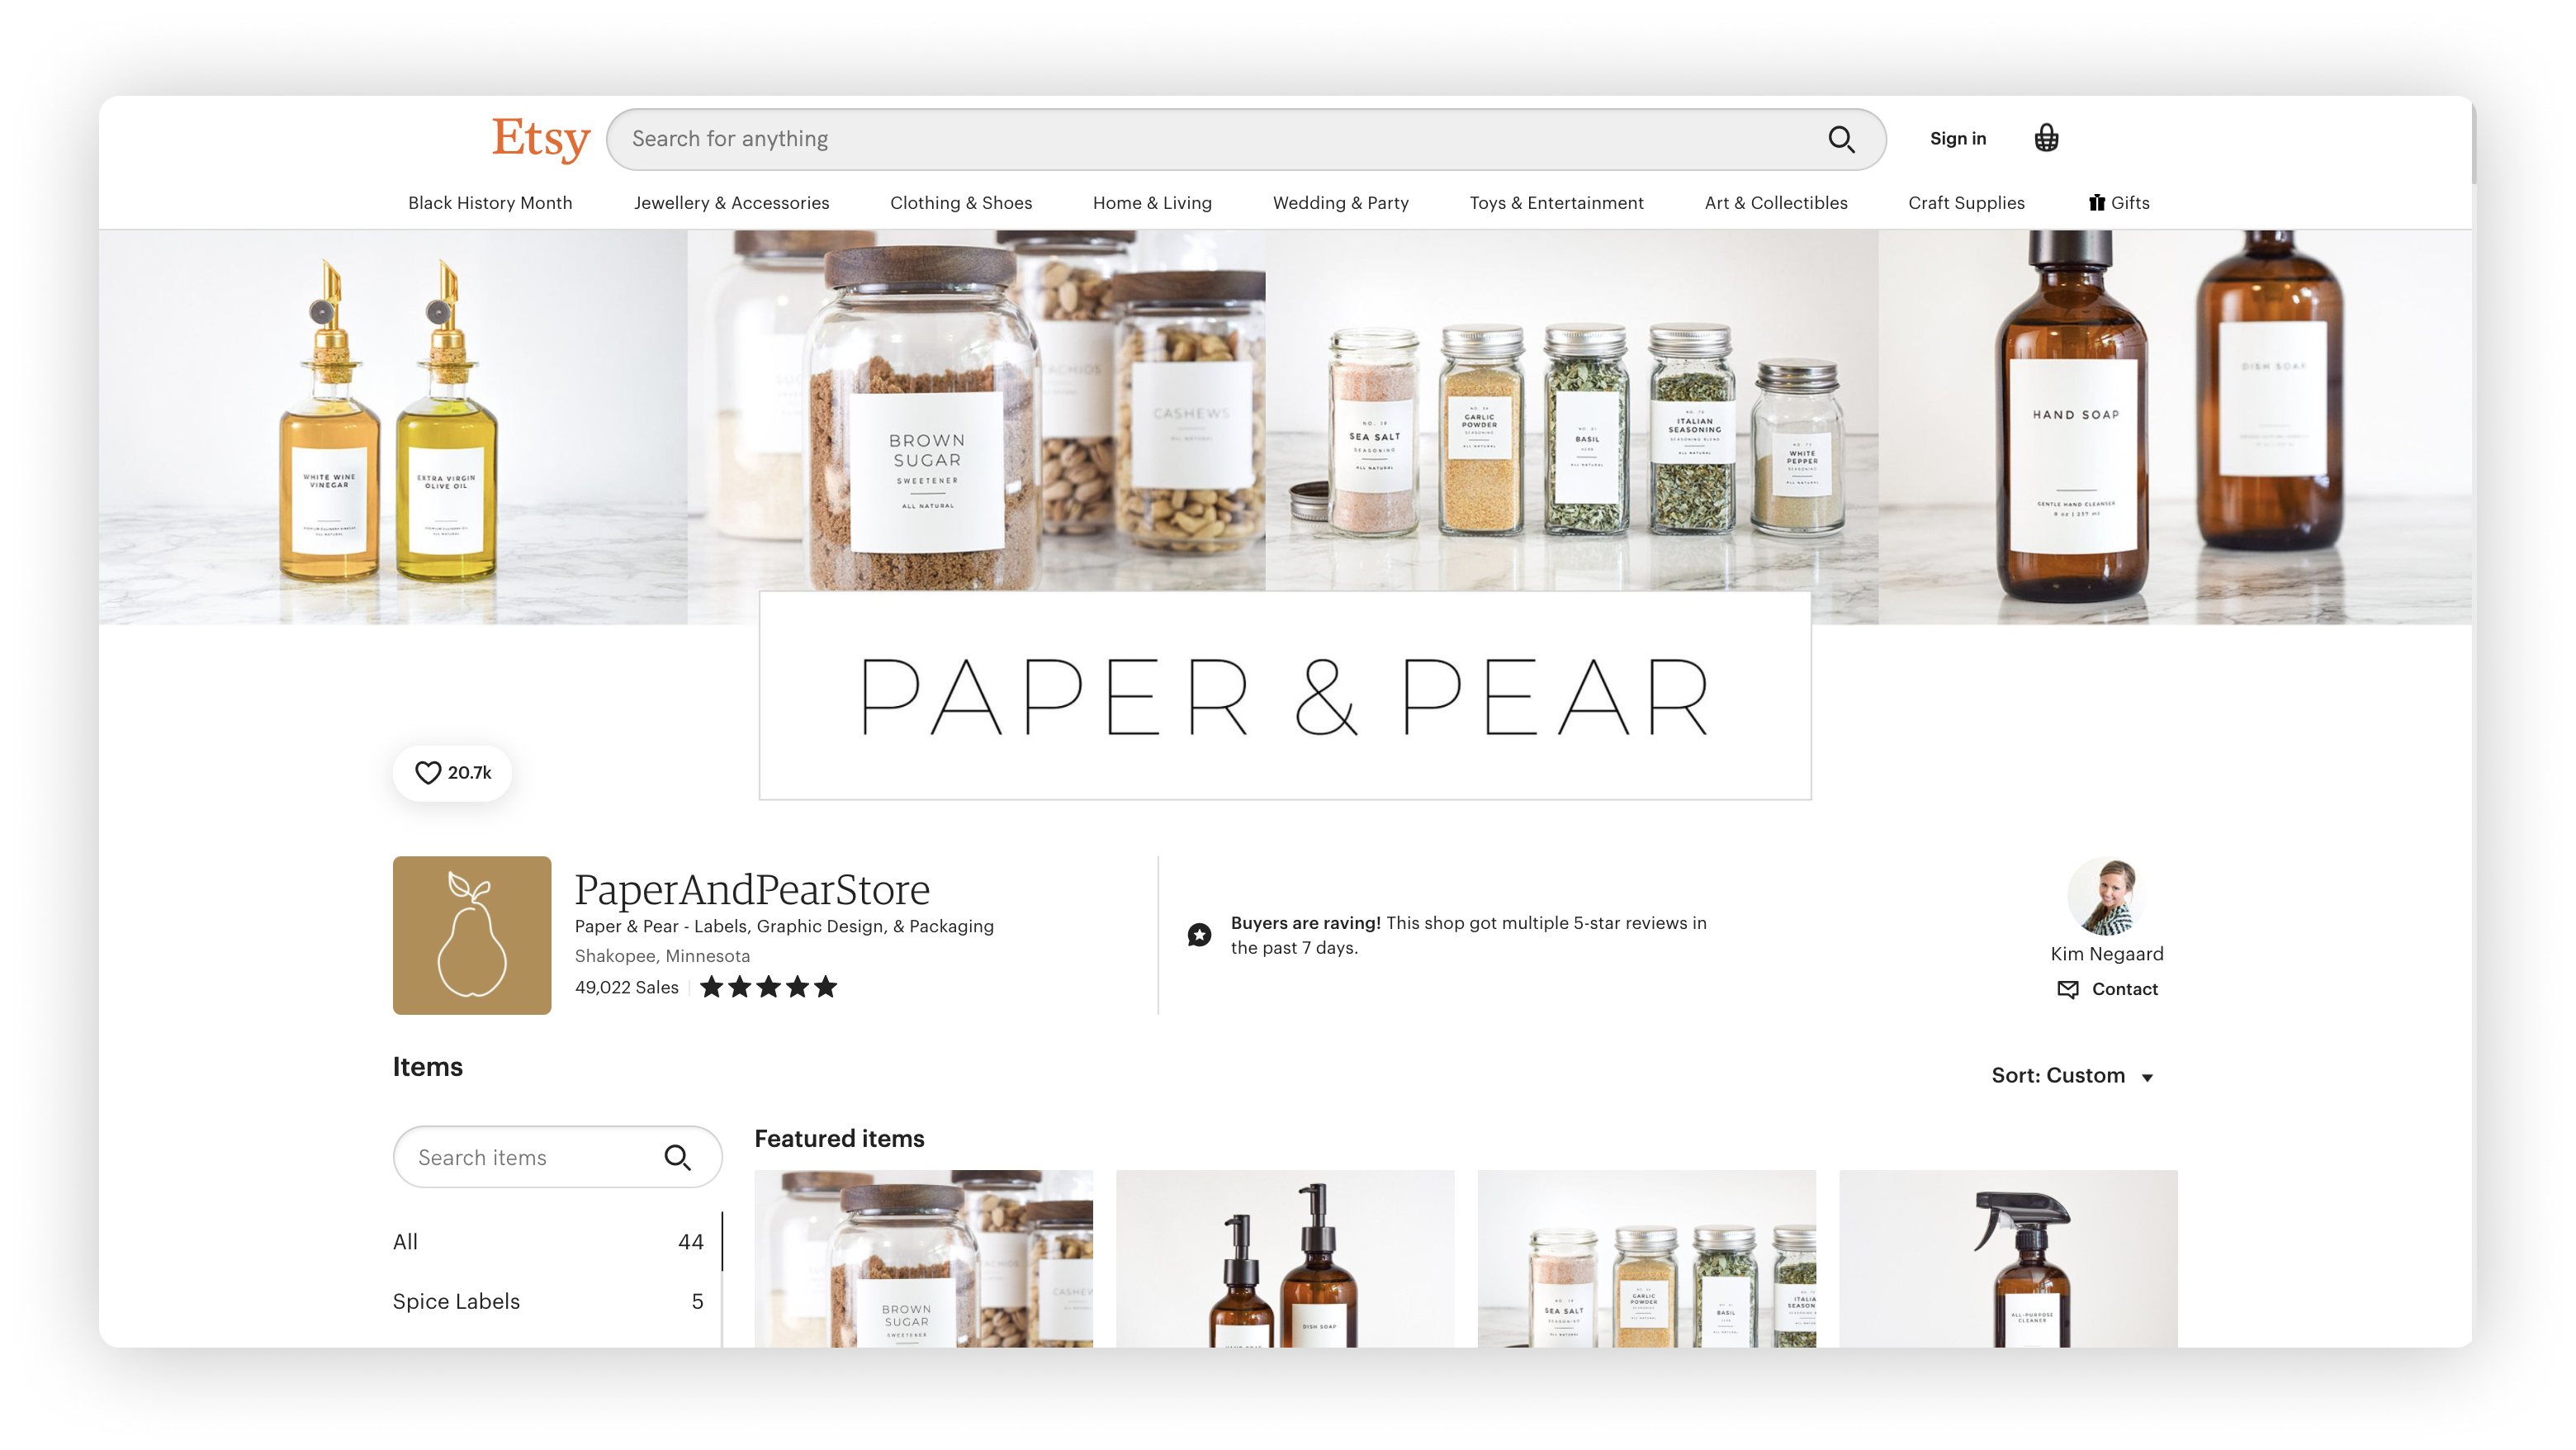 PaperAndPearStore